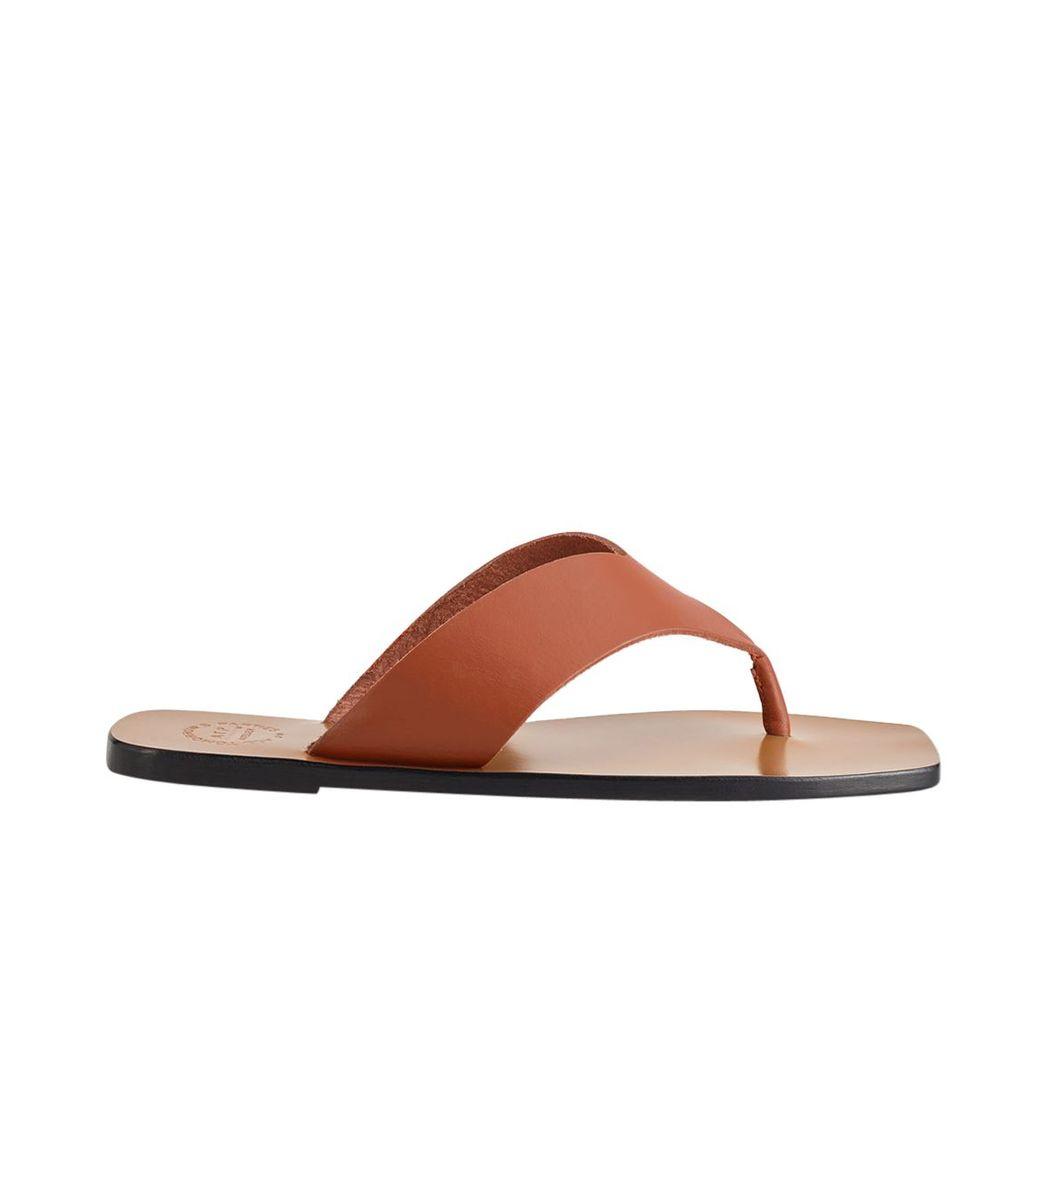 Atp Atelier Marine Rust Leather Sandals